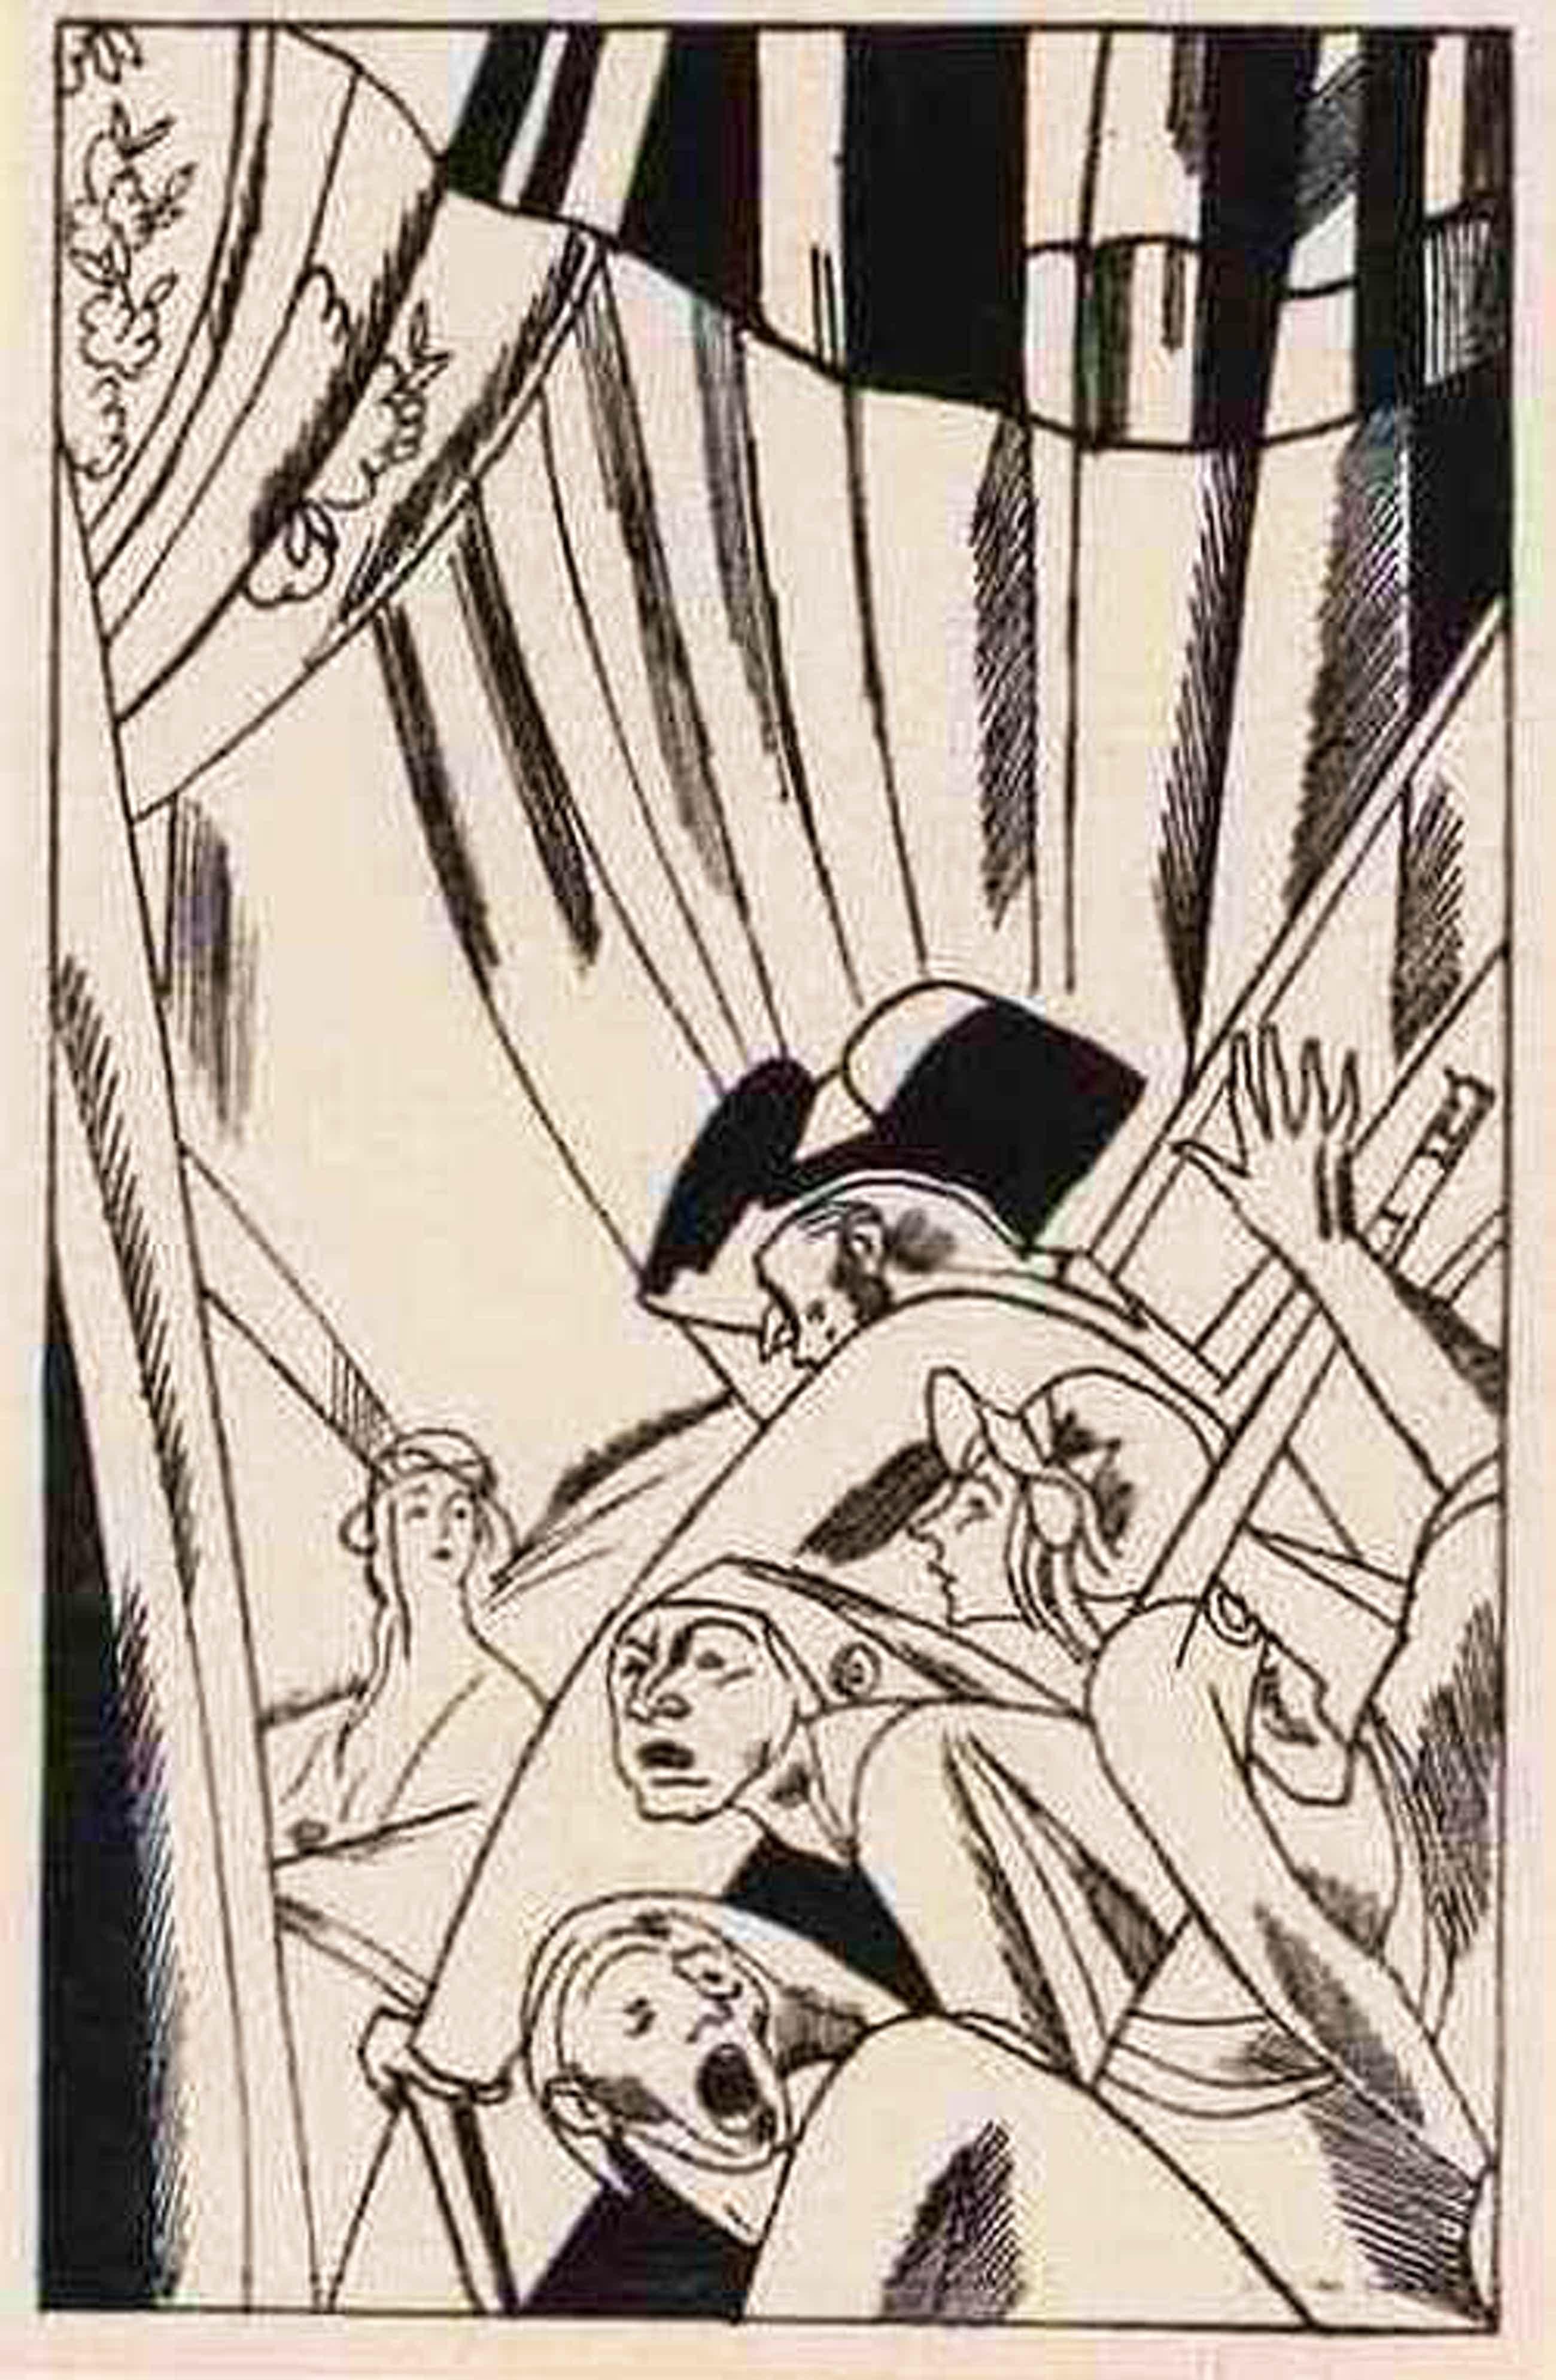 Edouard Lèon  Louis Legrand - Madame LUZY v. Anatol FRANCE - 1922 - SUITE der 21 OriginalHolzschnitte zur FRANZ.REVOLUTION kopen? Bied vanaf 95!